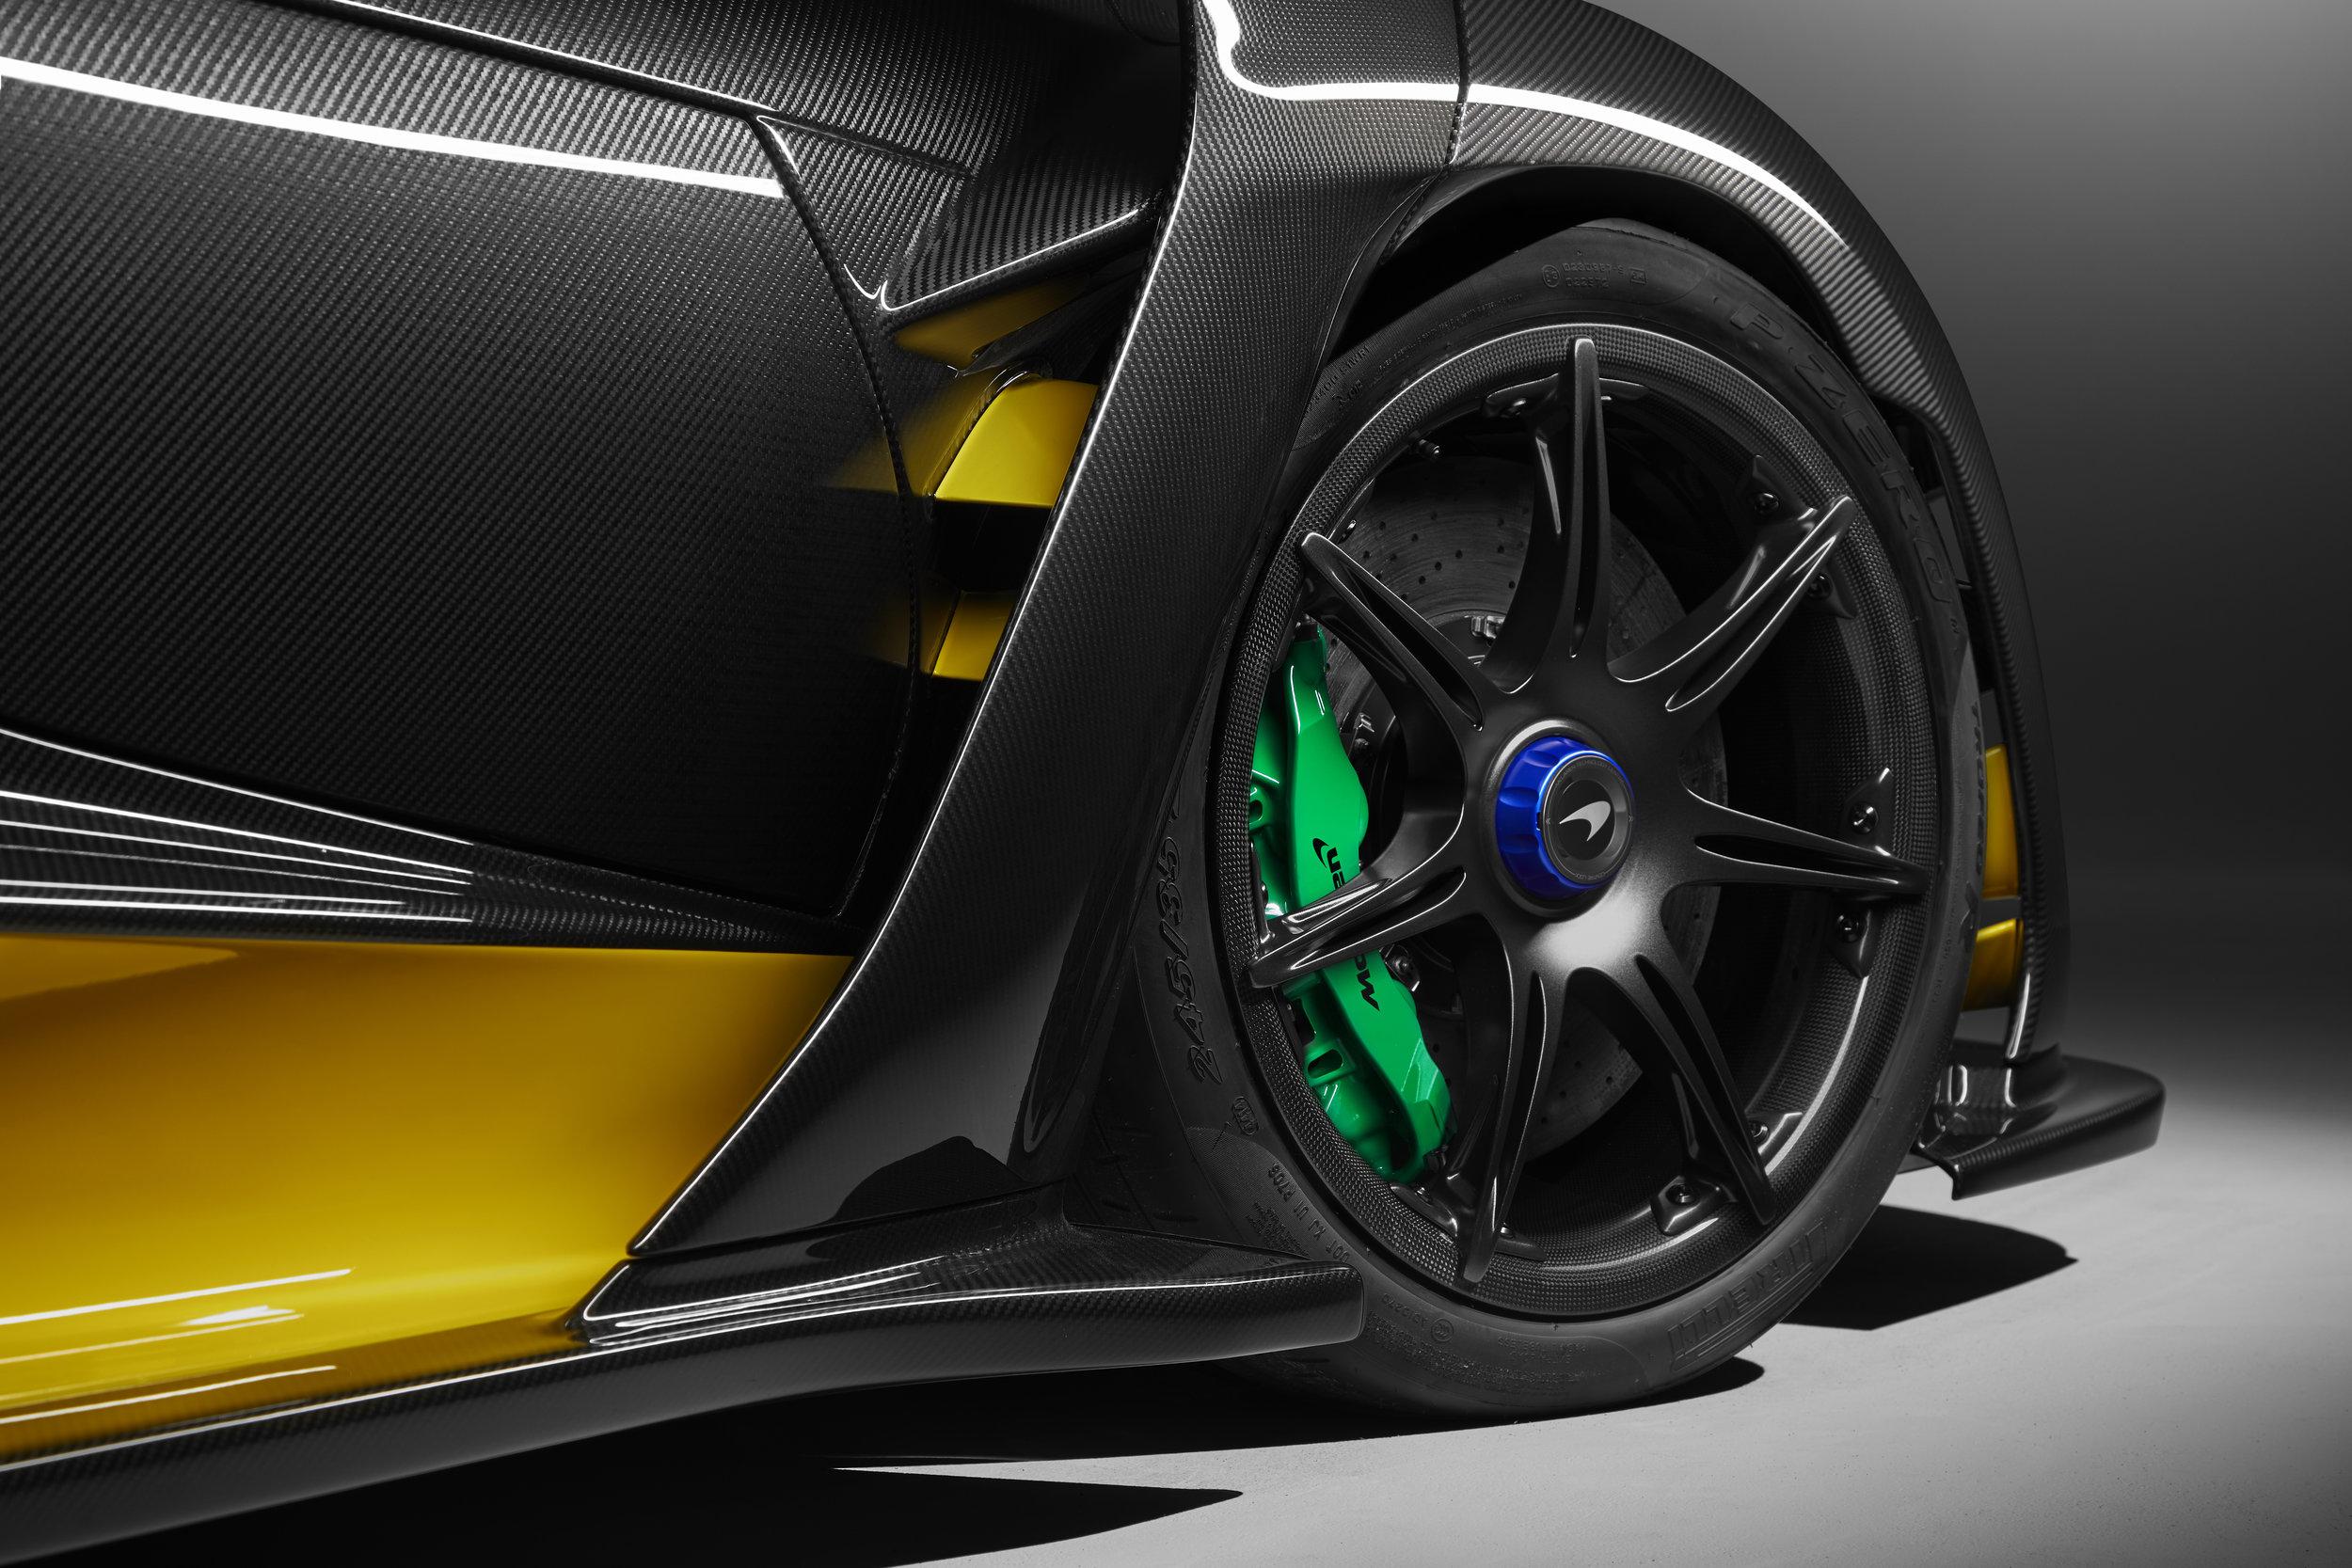 8953McLaren-Senna-Carbon-Theme-by-MSO_03.jpg